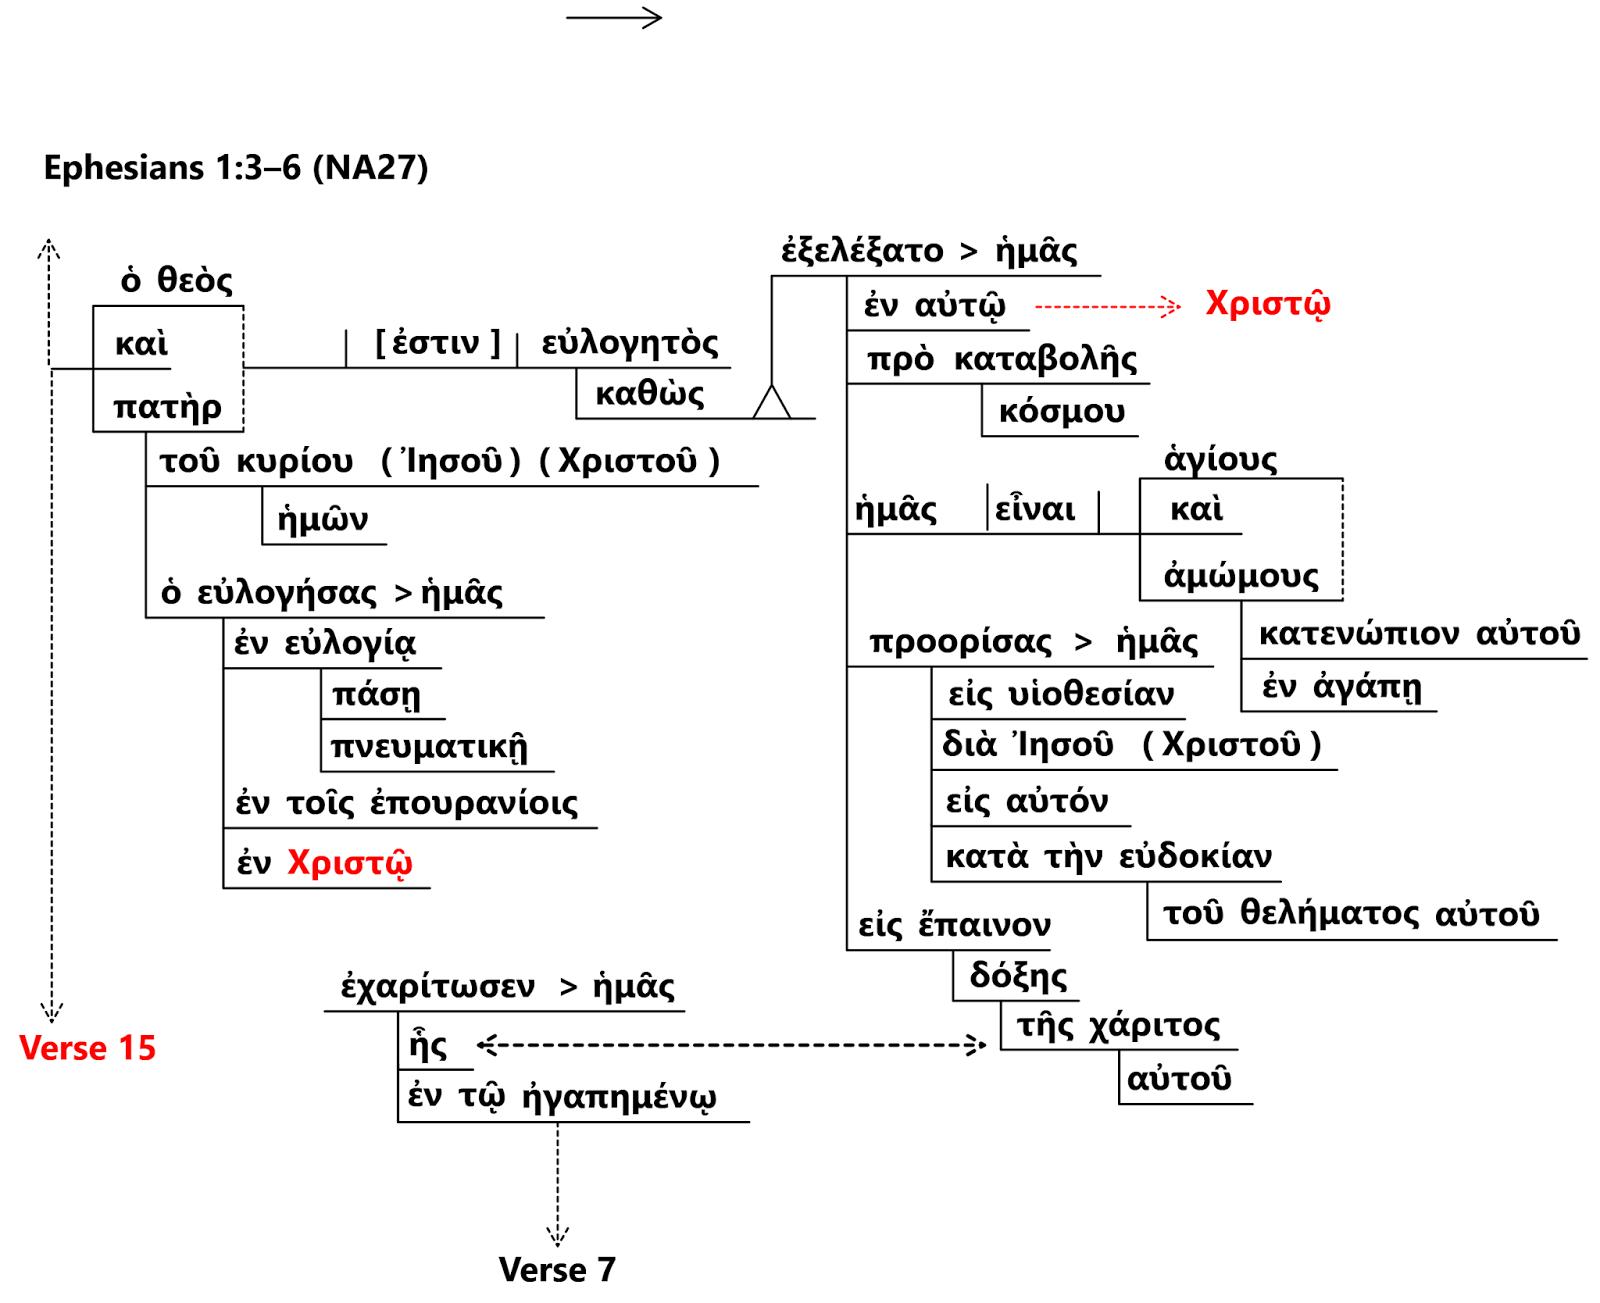 ephesians 1:2-6 grammatical diagram